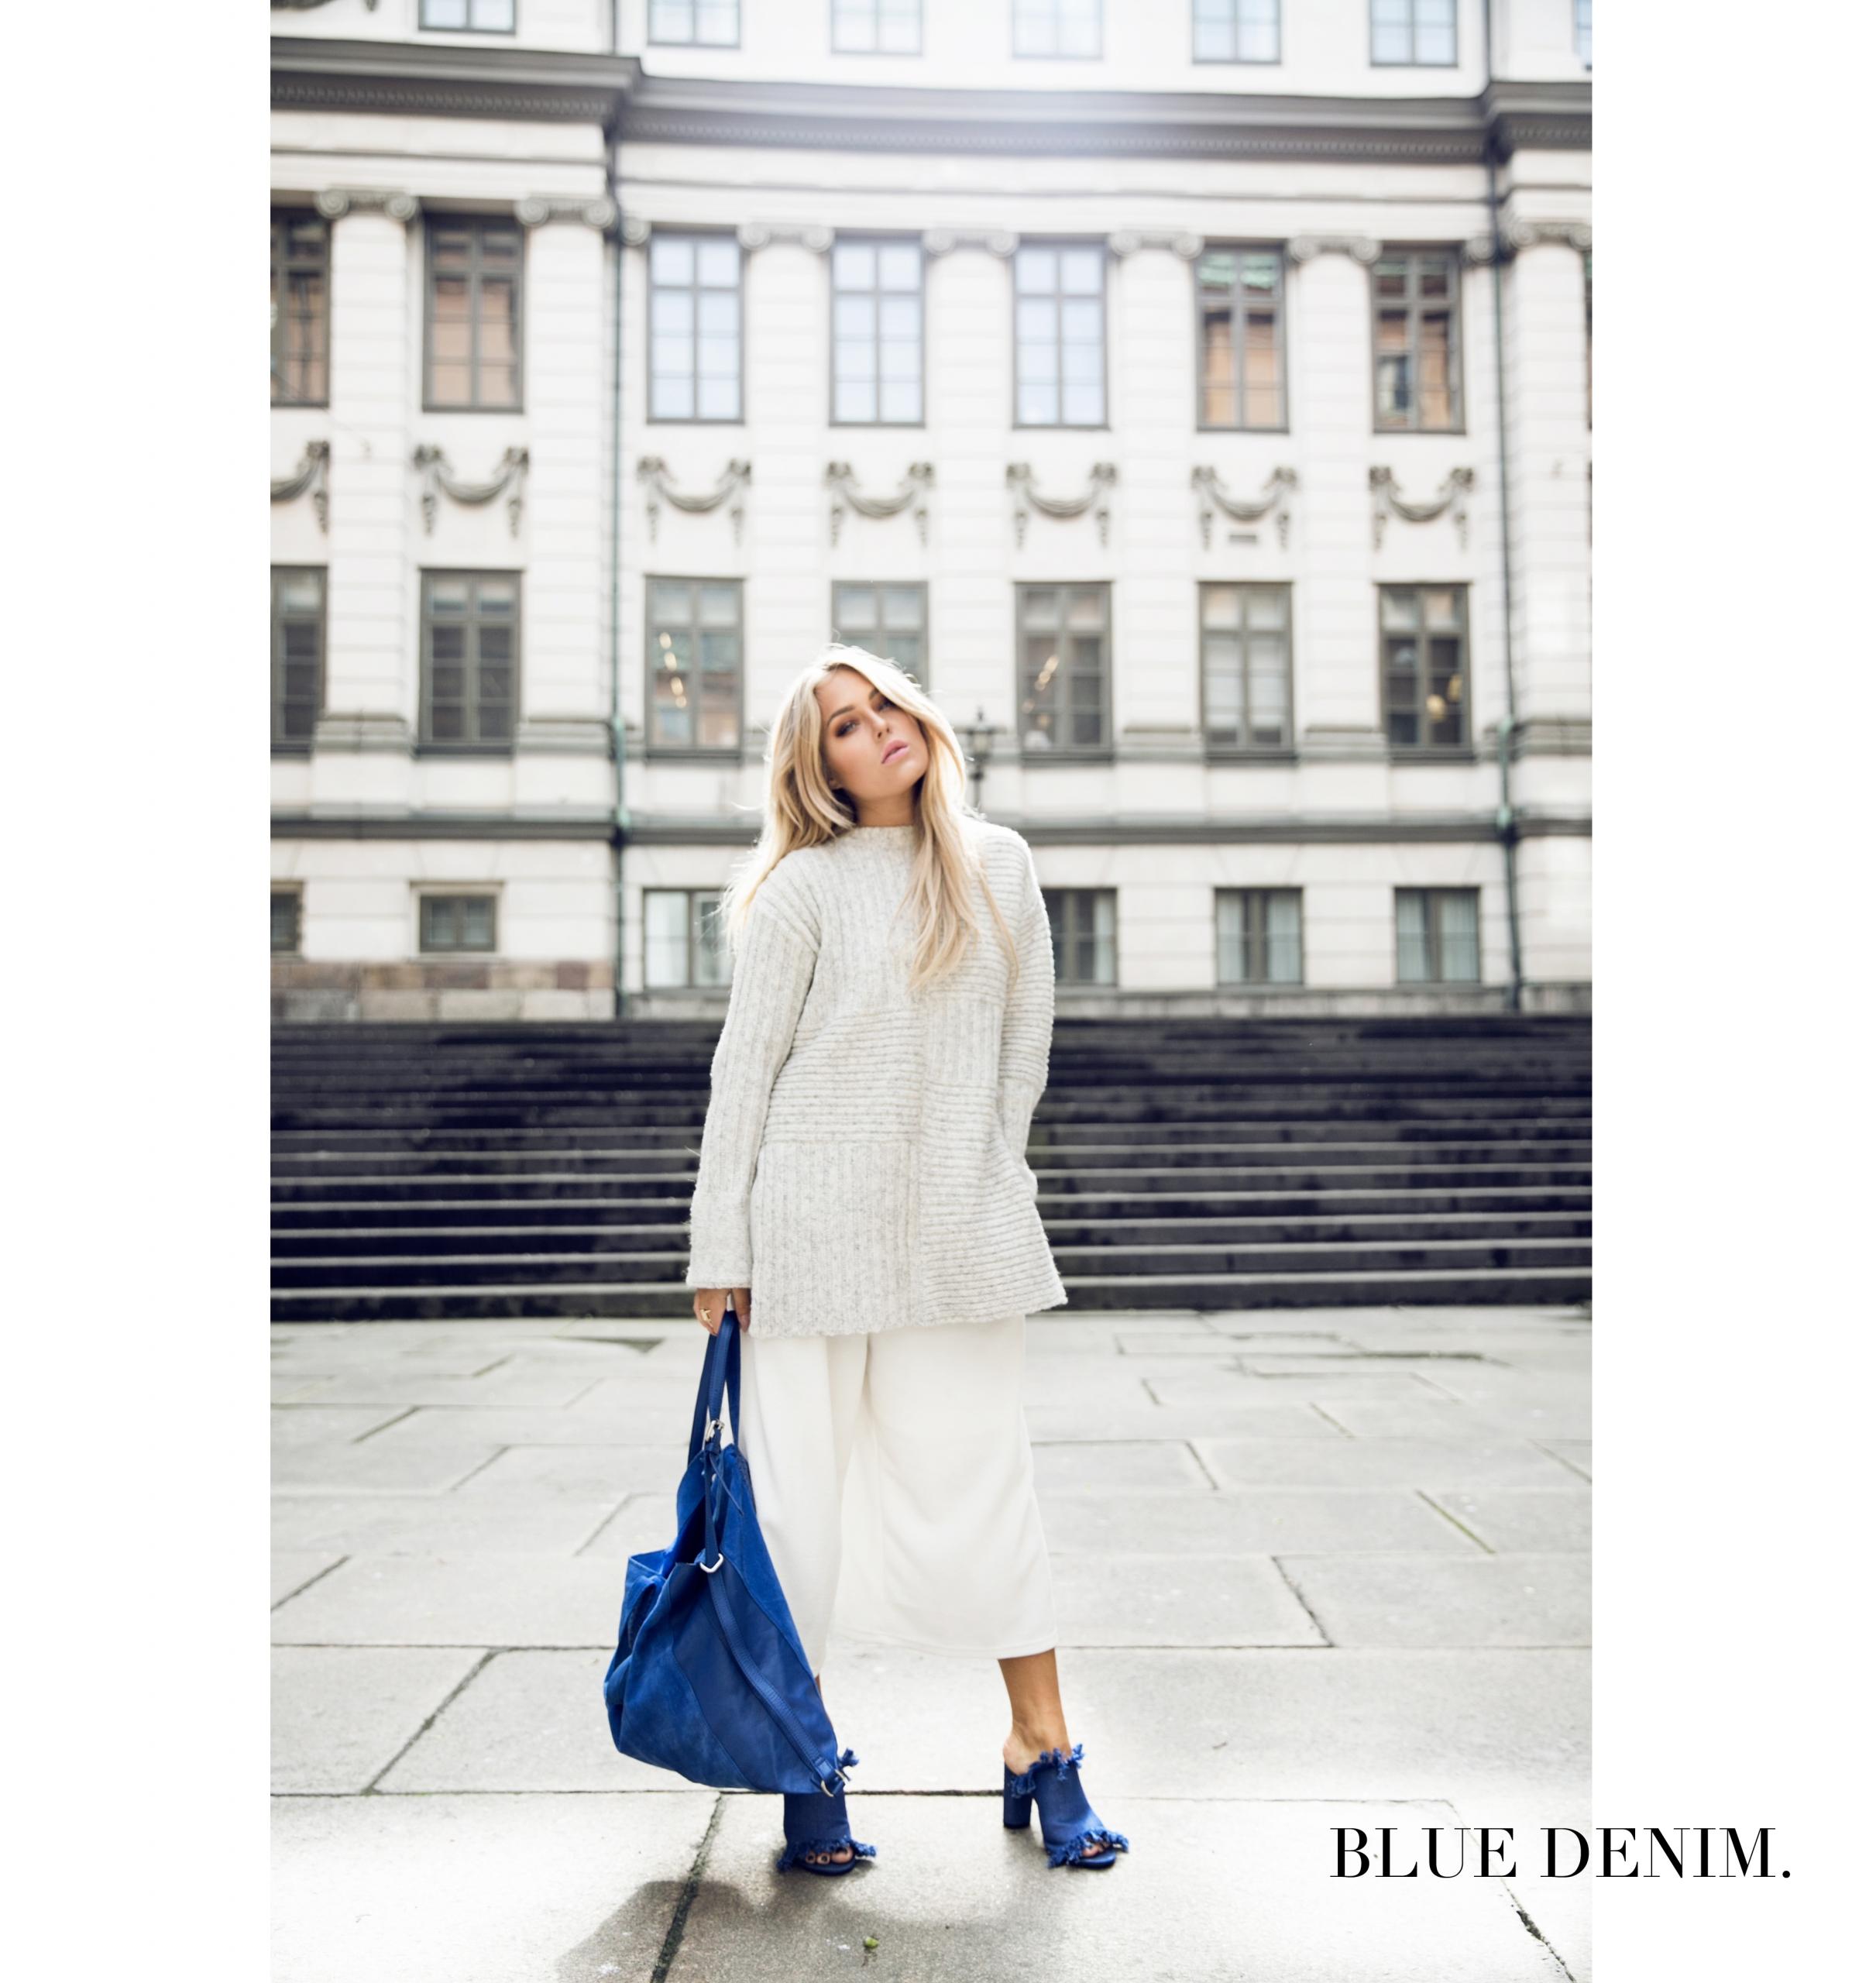 bluedenim_angelicablick11